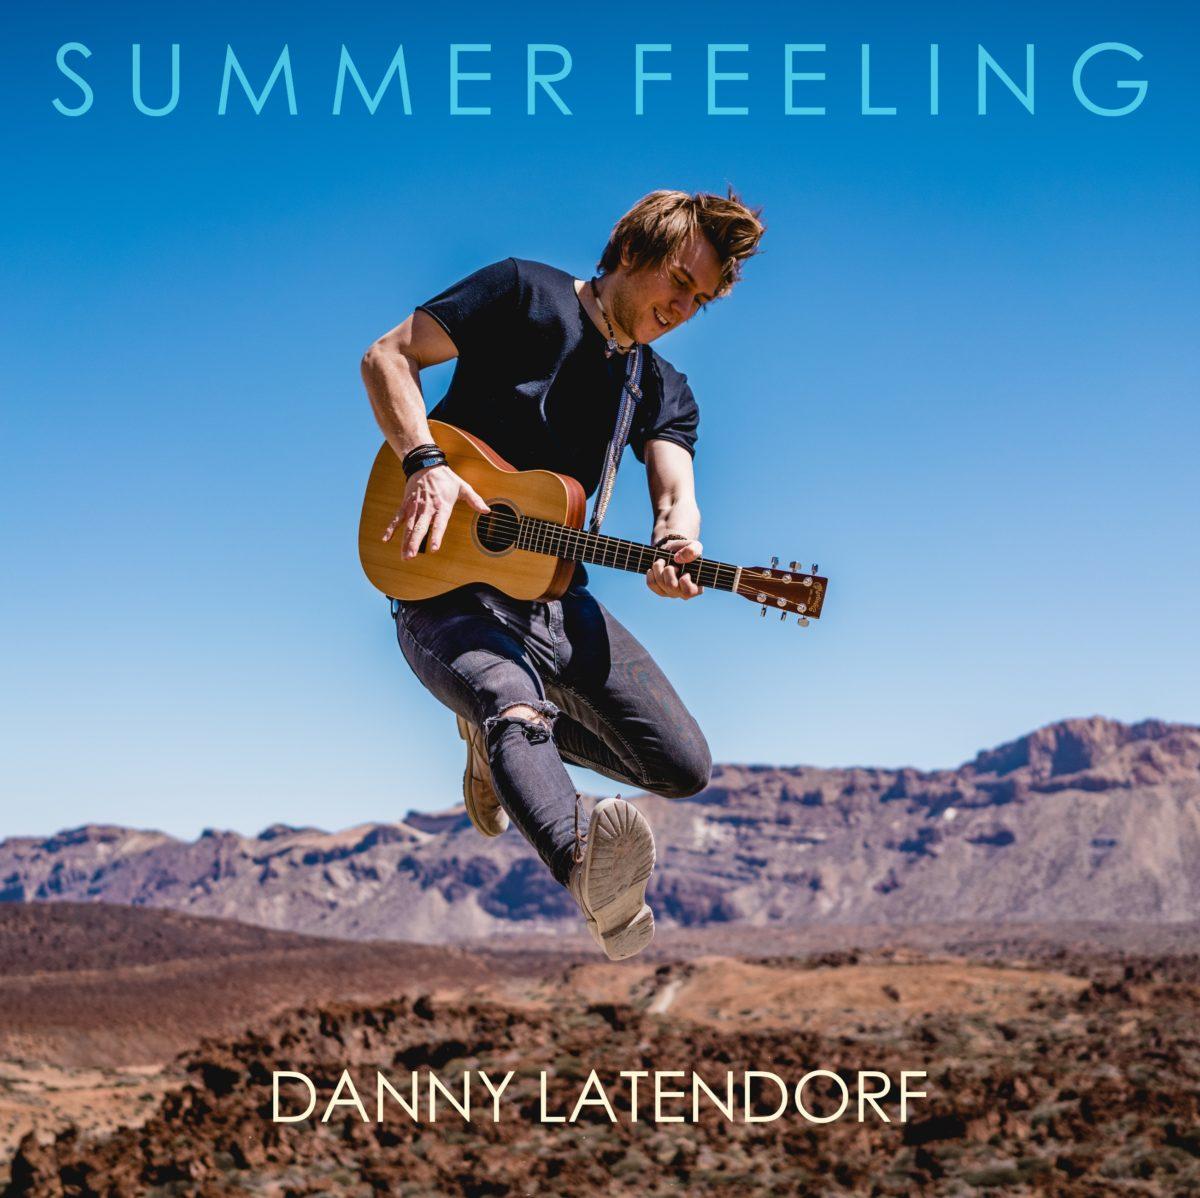 Danny Latendorf (Credit VTVISUALS)